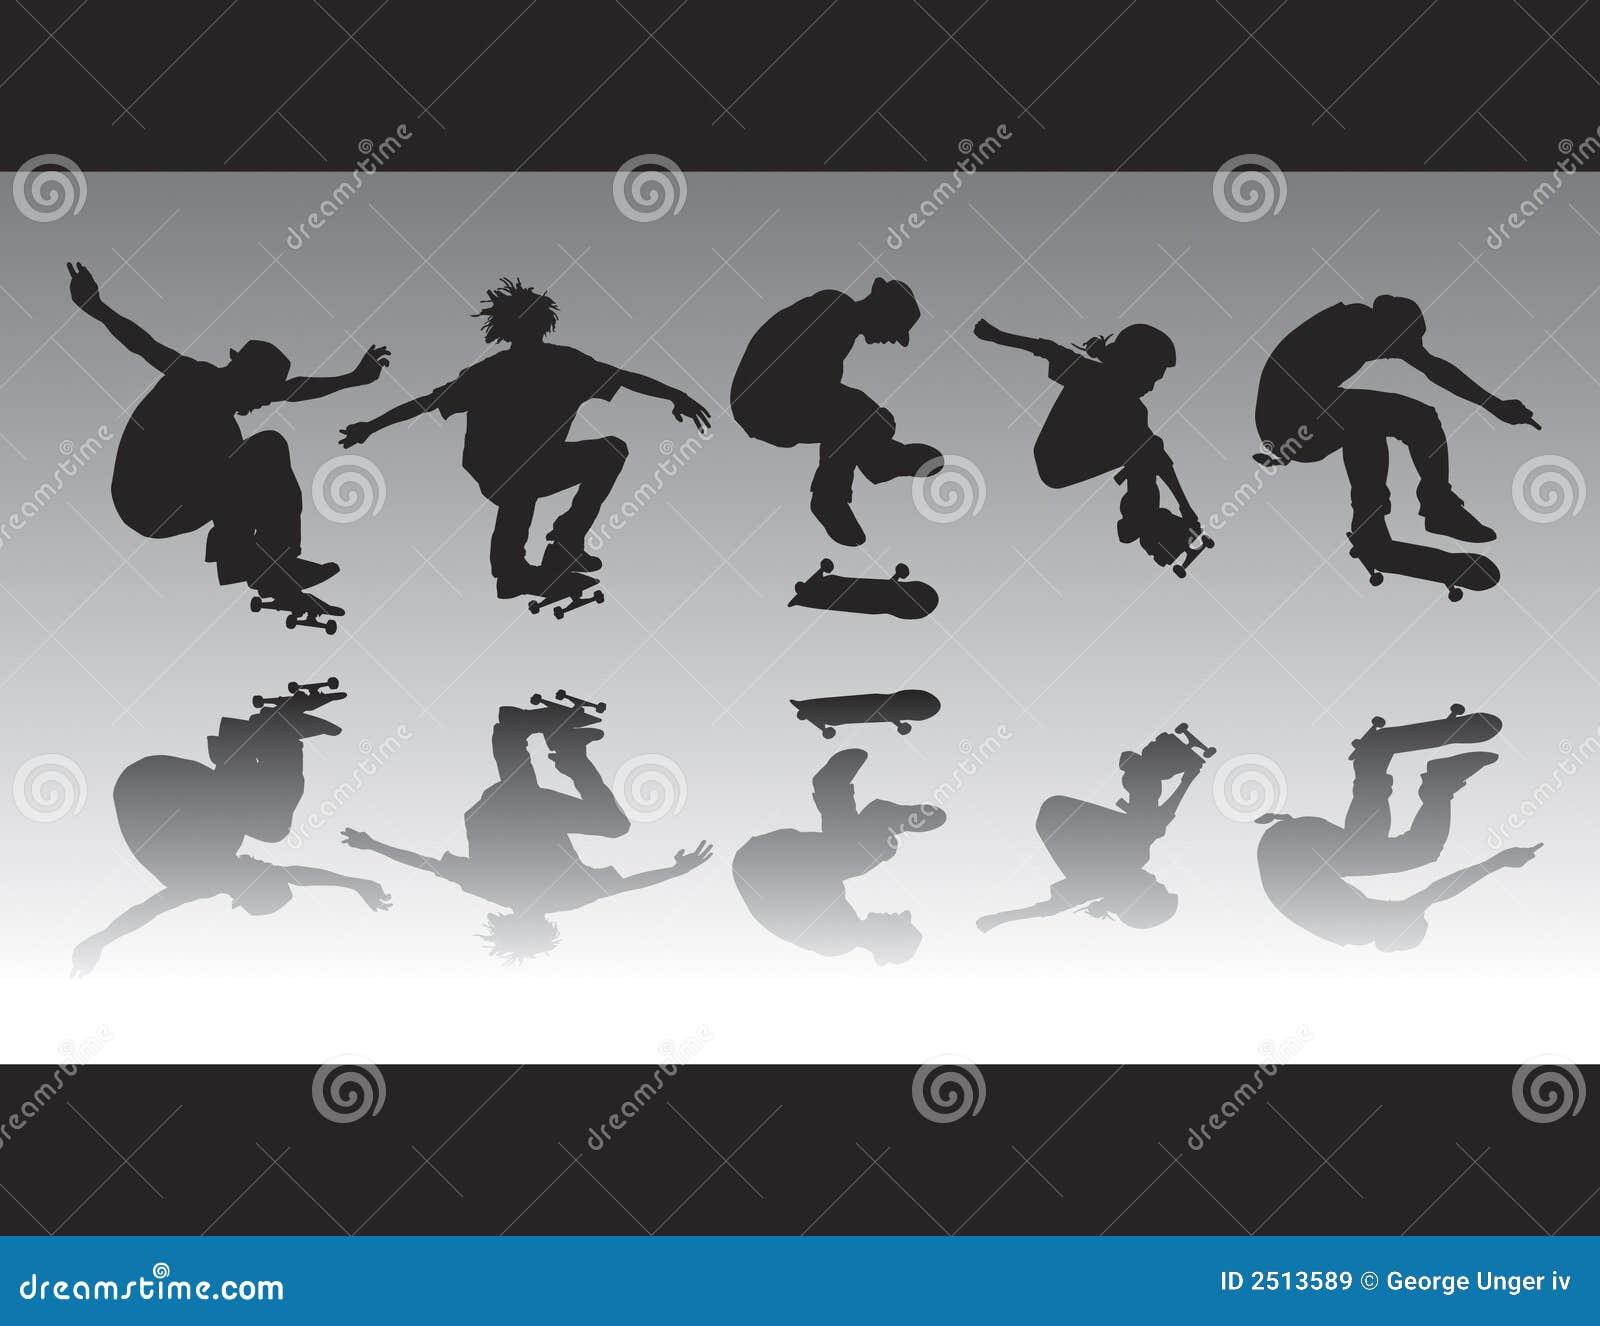 Skate Figure Silhouettes II